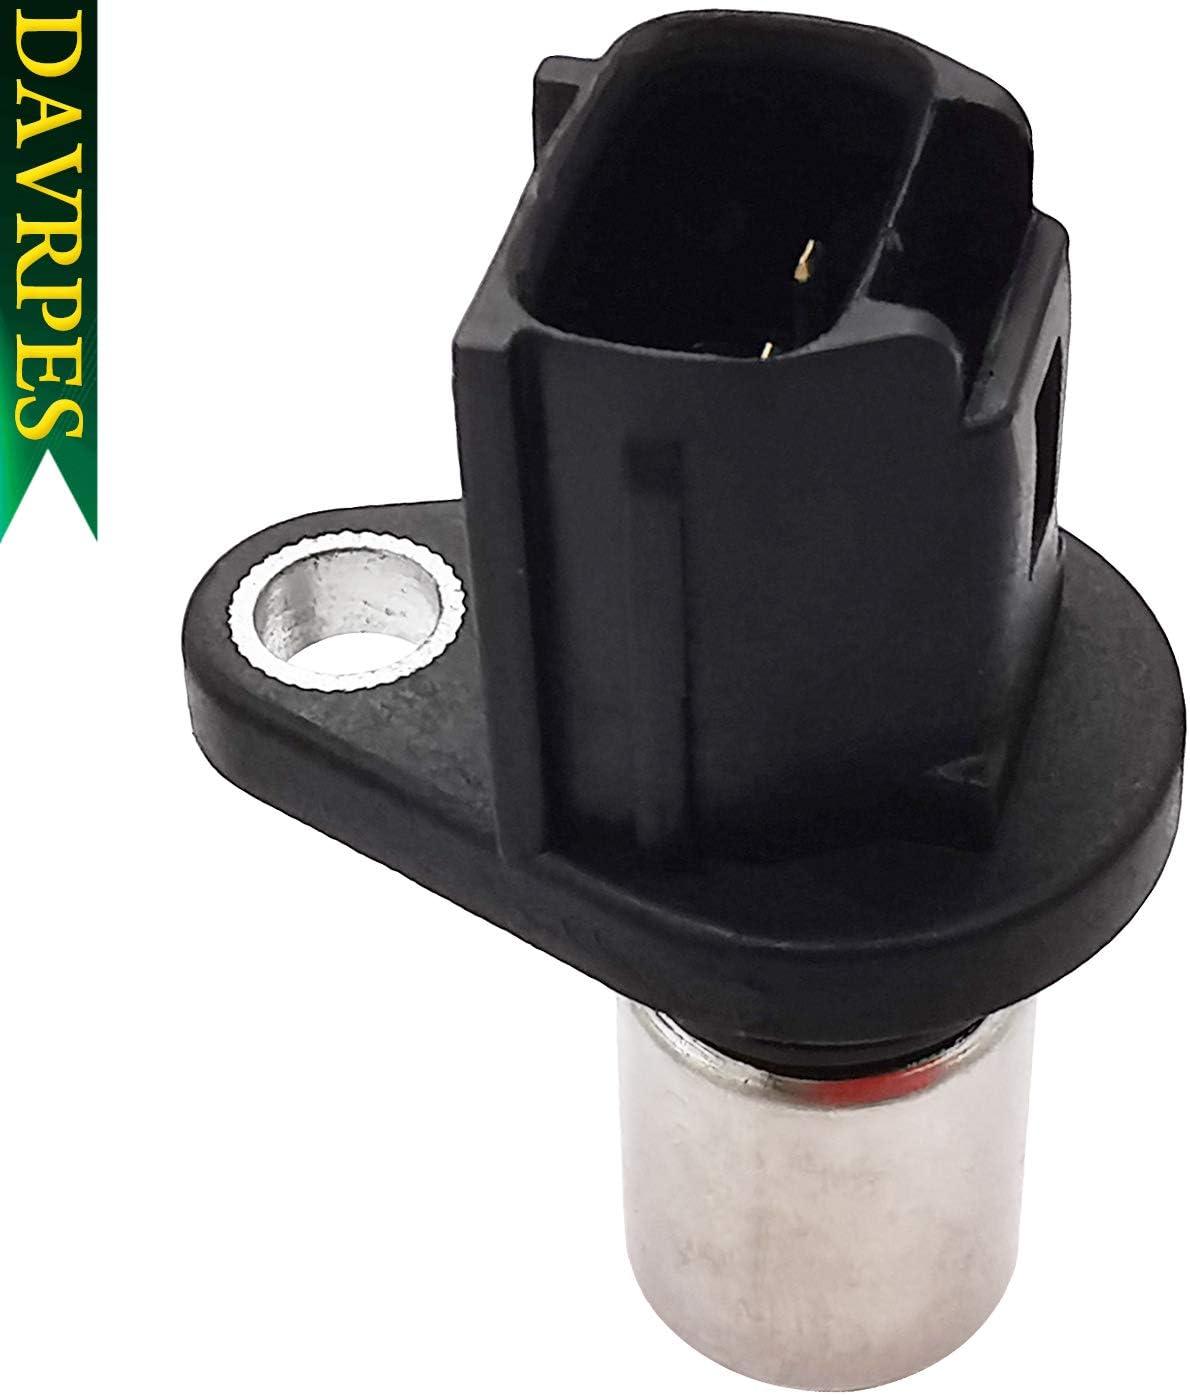 DAVRPES 90919-05024 Camshaft Position Sensor Enigne For Lexus Scion For Toyota Tacoma Replace#